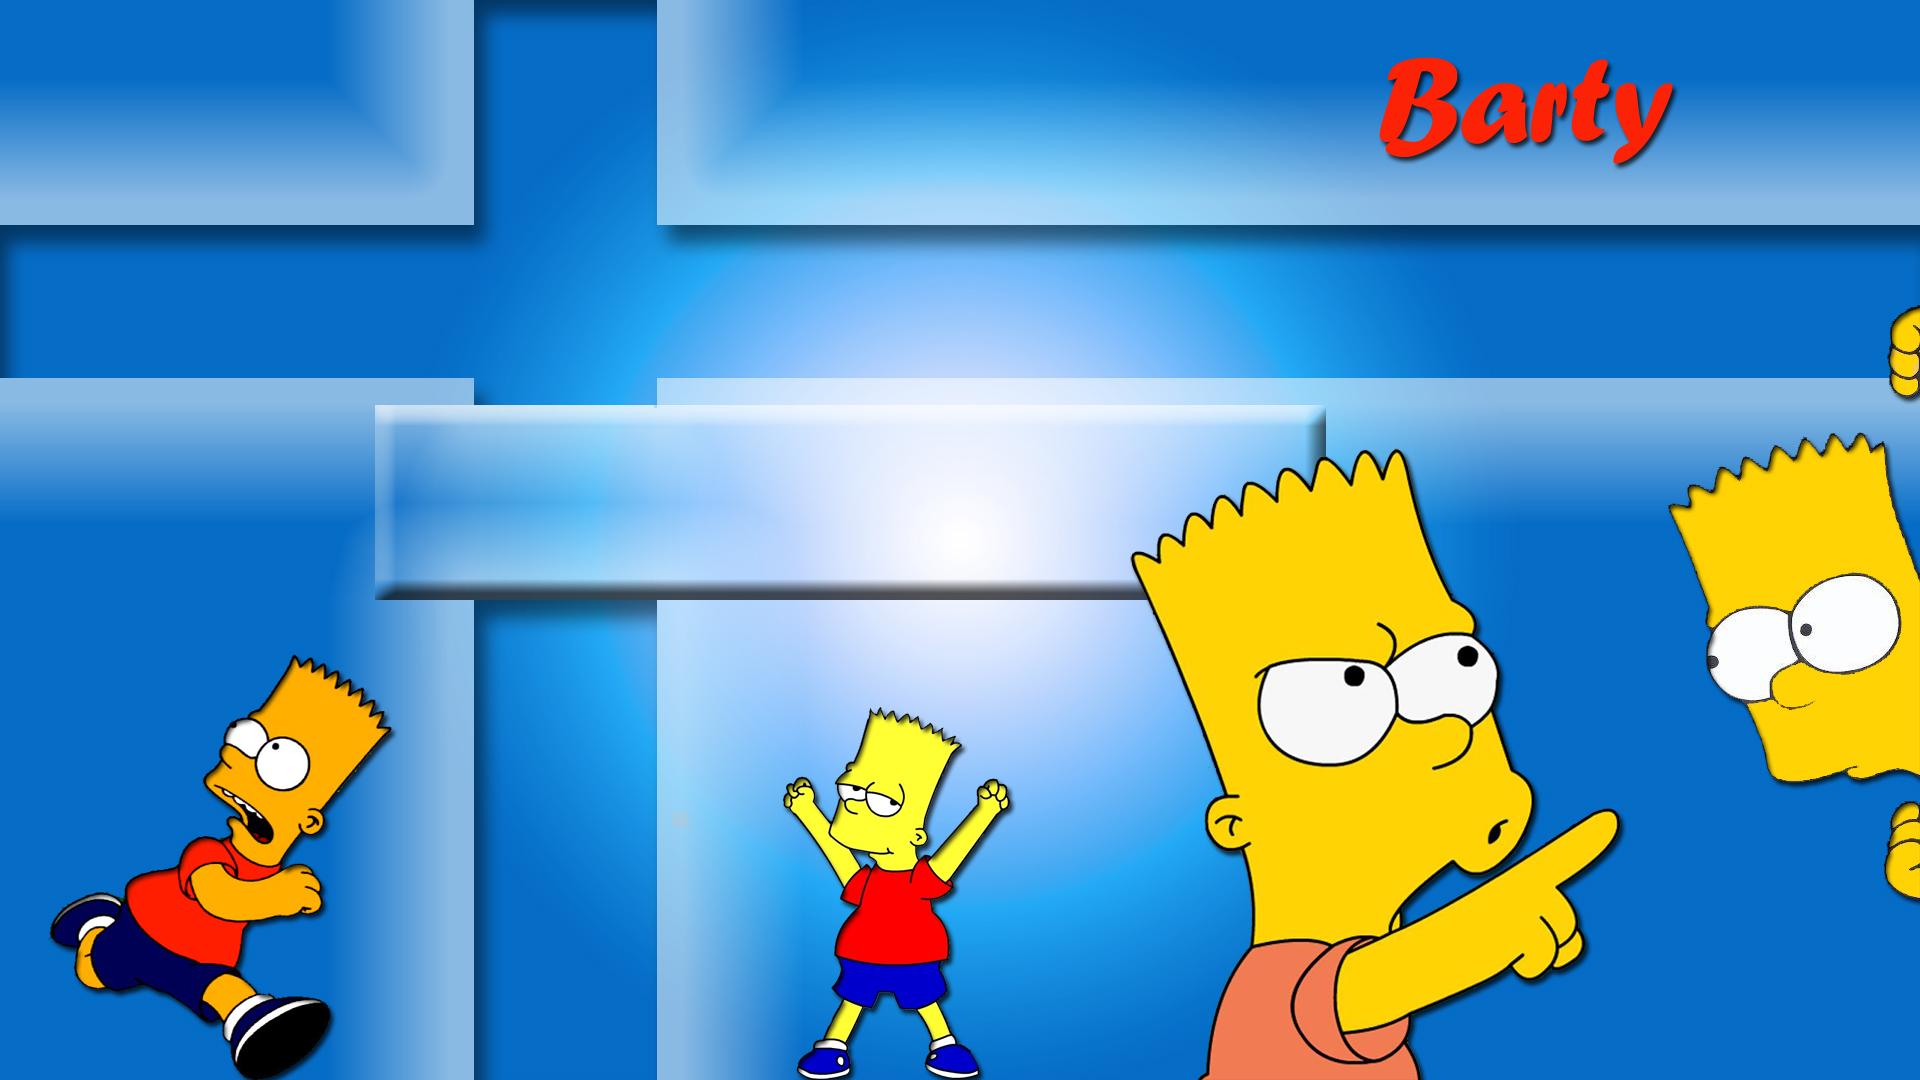 Bart Simpson wallpaper   344243 1920x1080